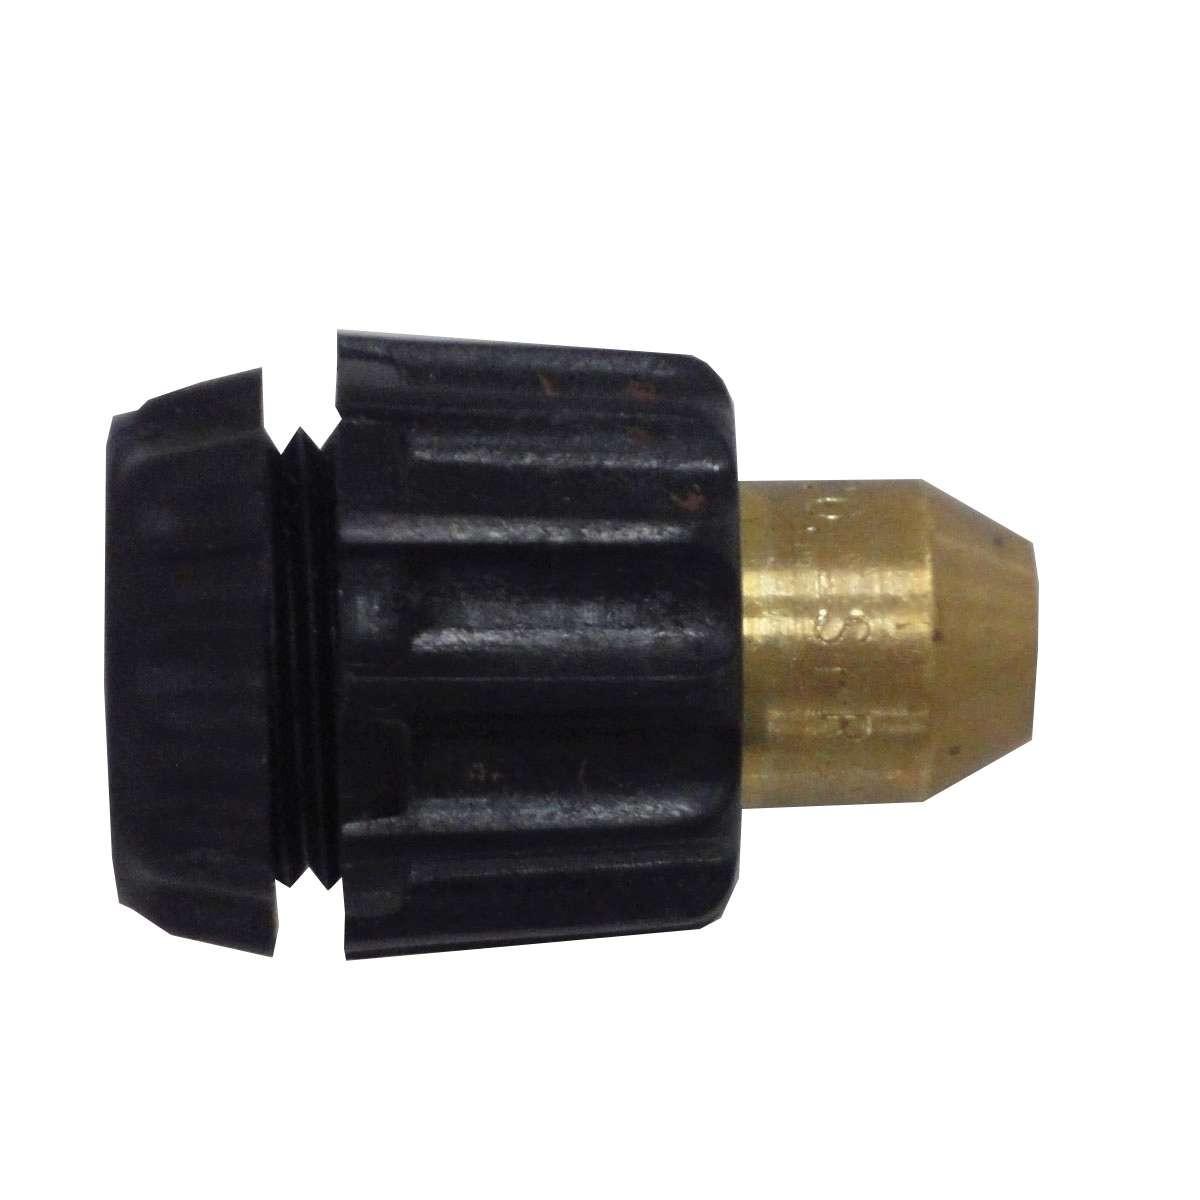 Vollkegeldüse TG 3 - 3 mm Düsenöffnung